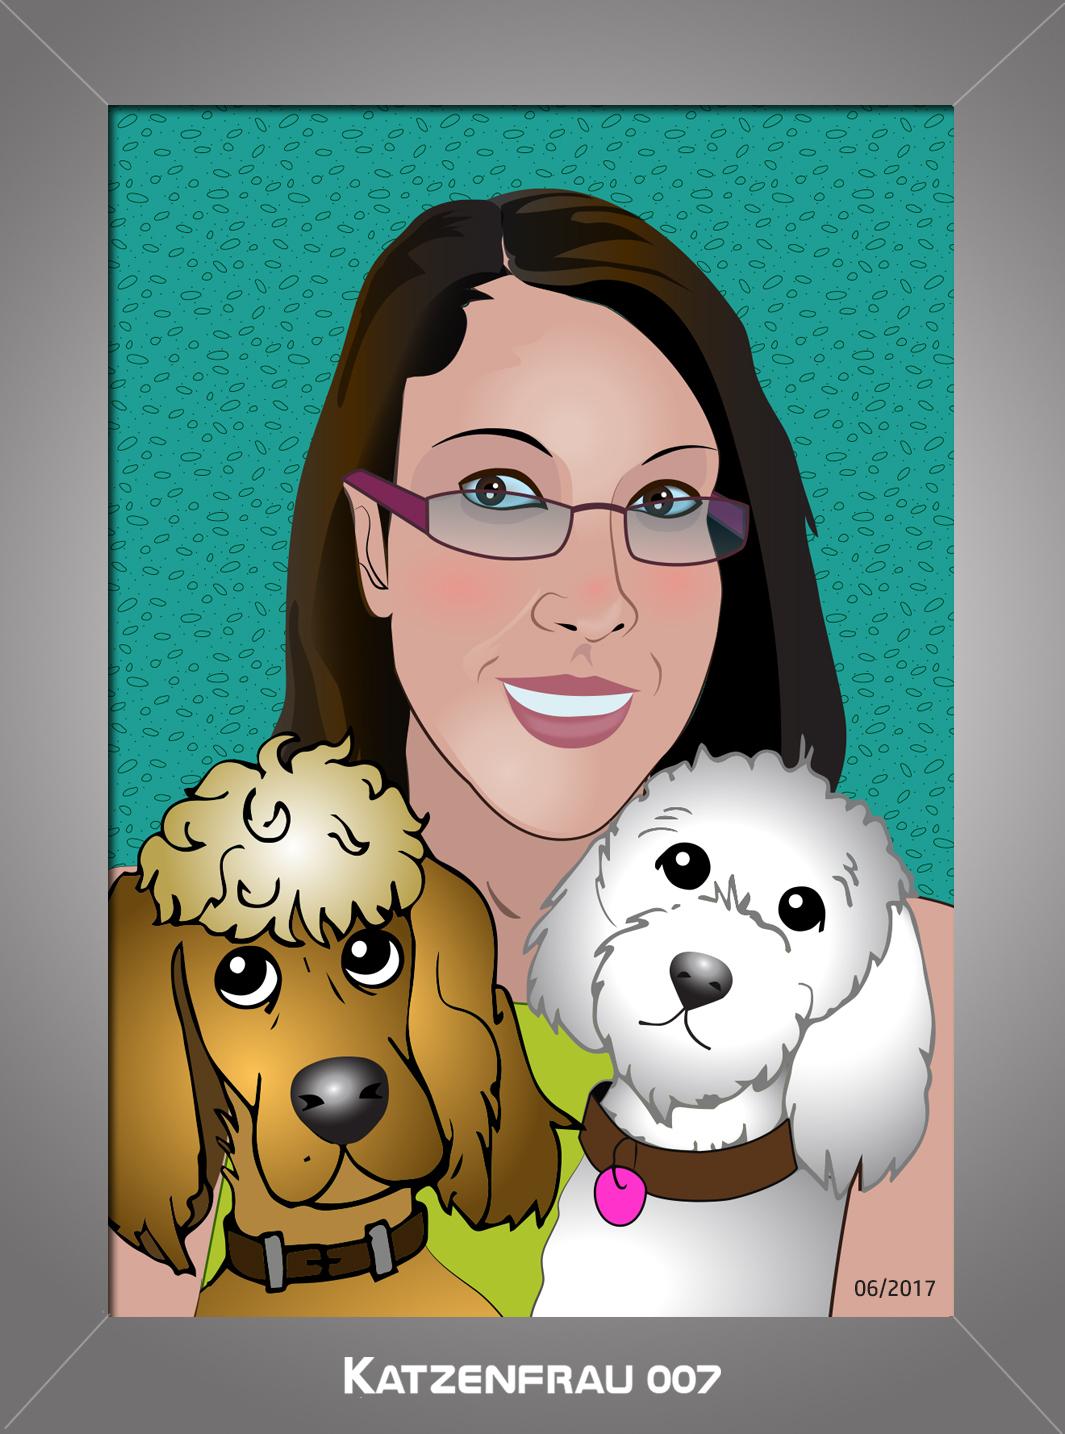 Happy family illustrated by Ingrid Steele (Katzenfrau007)